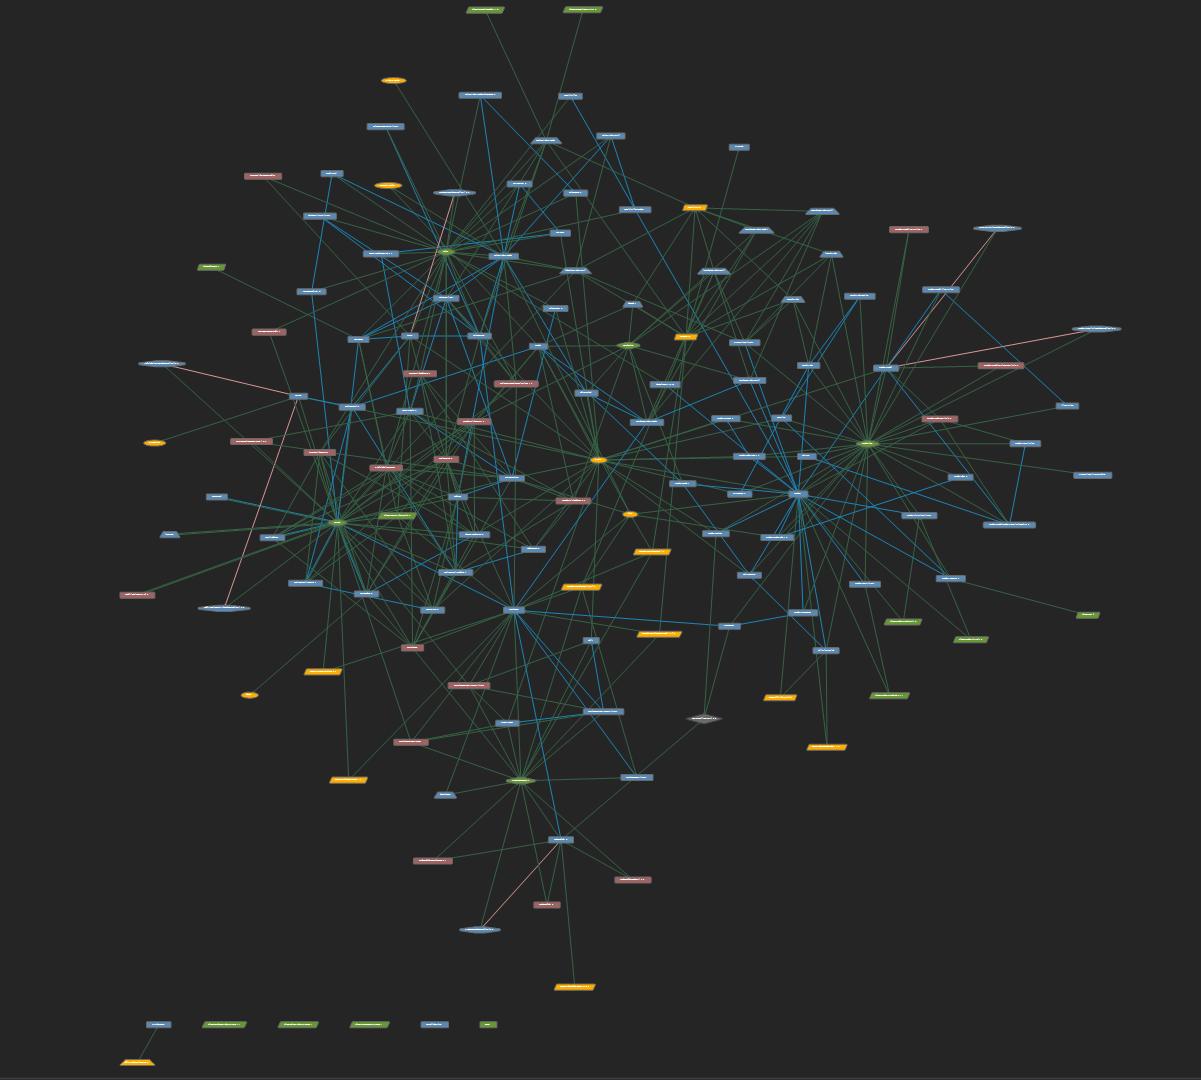 adventureworks 2012 diagram dfd context microsoft sql server historical sample database tour